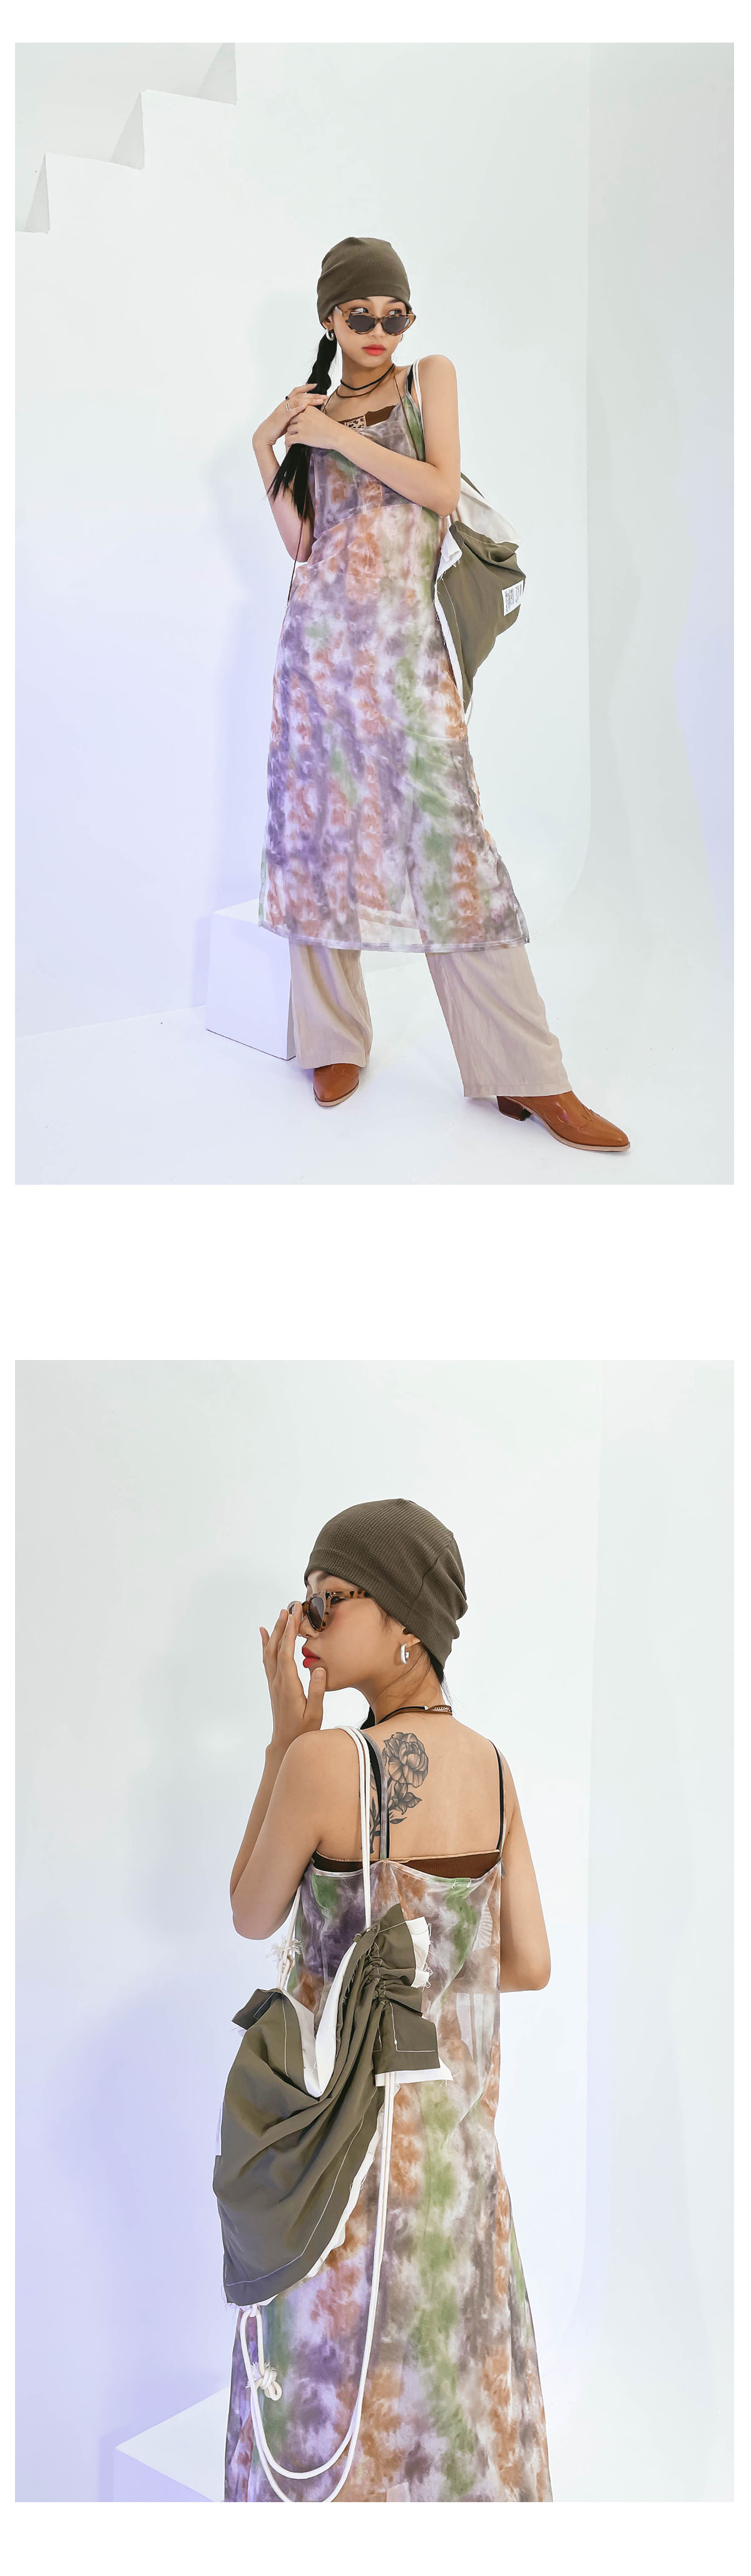 tie-dye see-through Dress